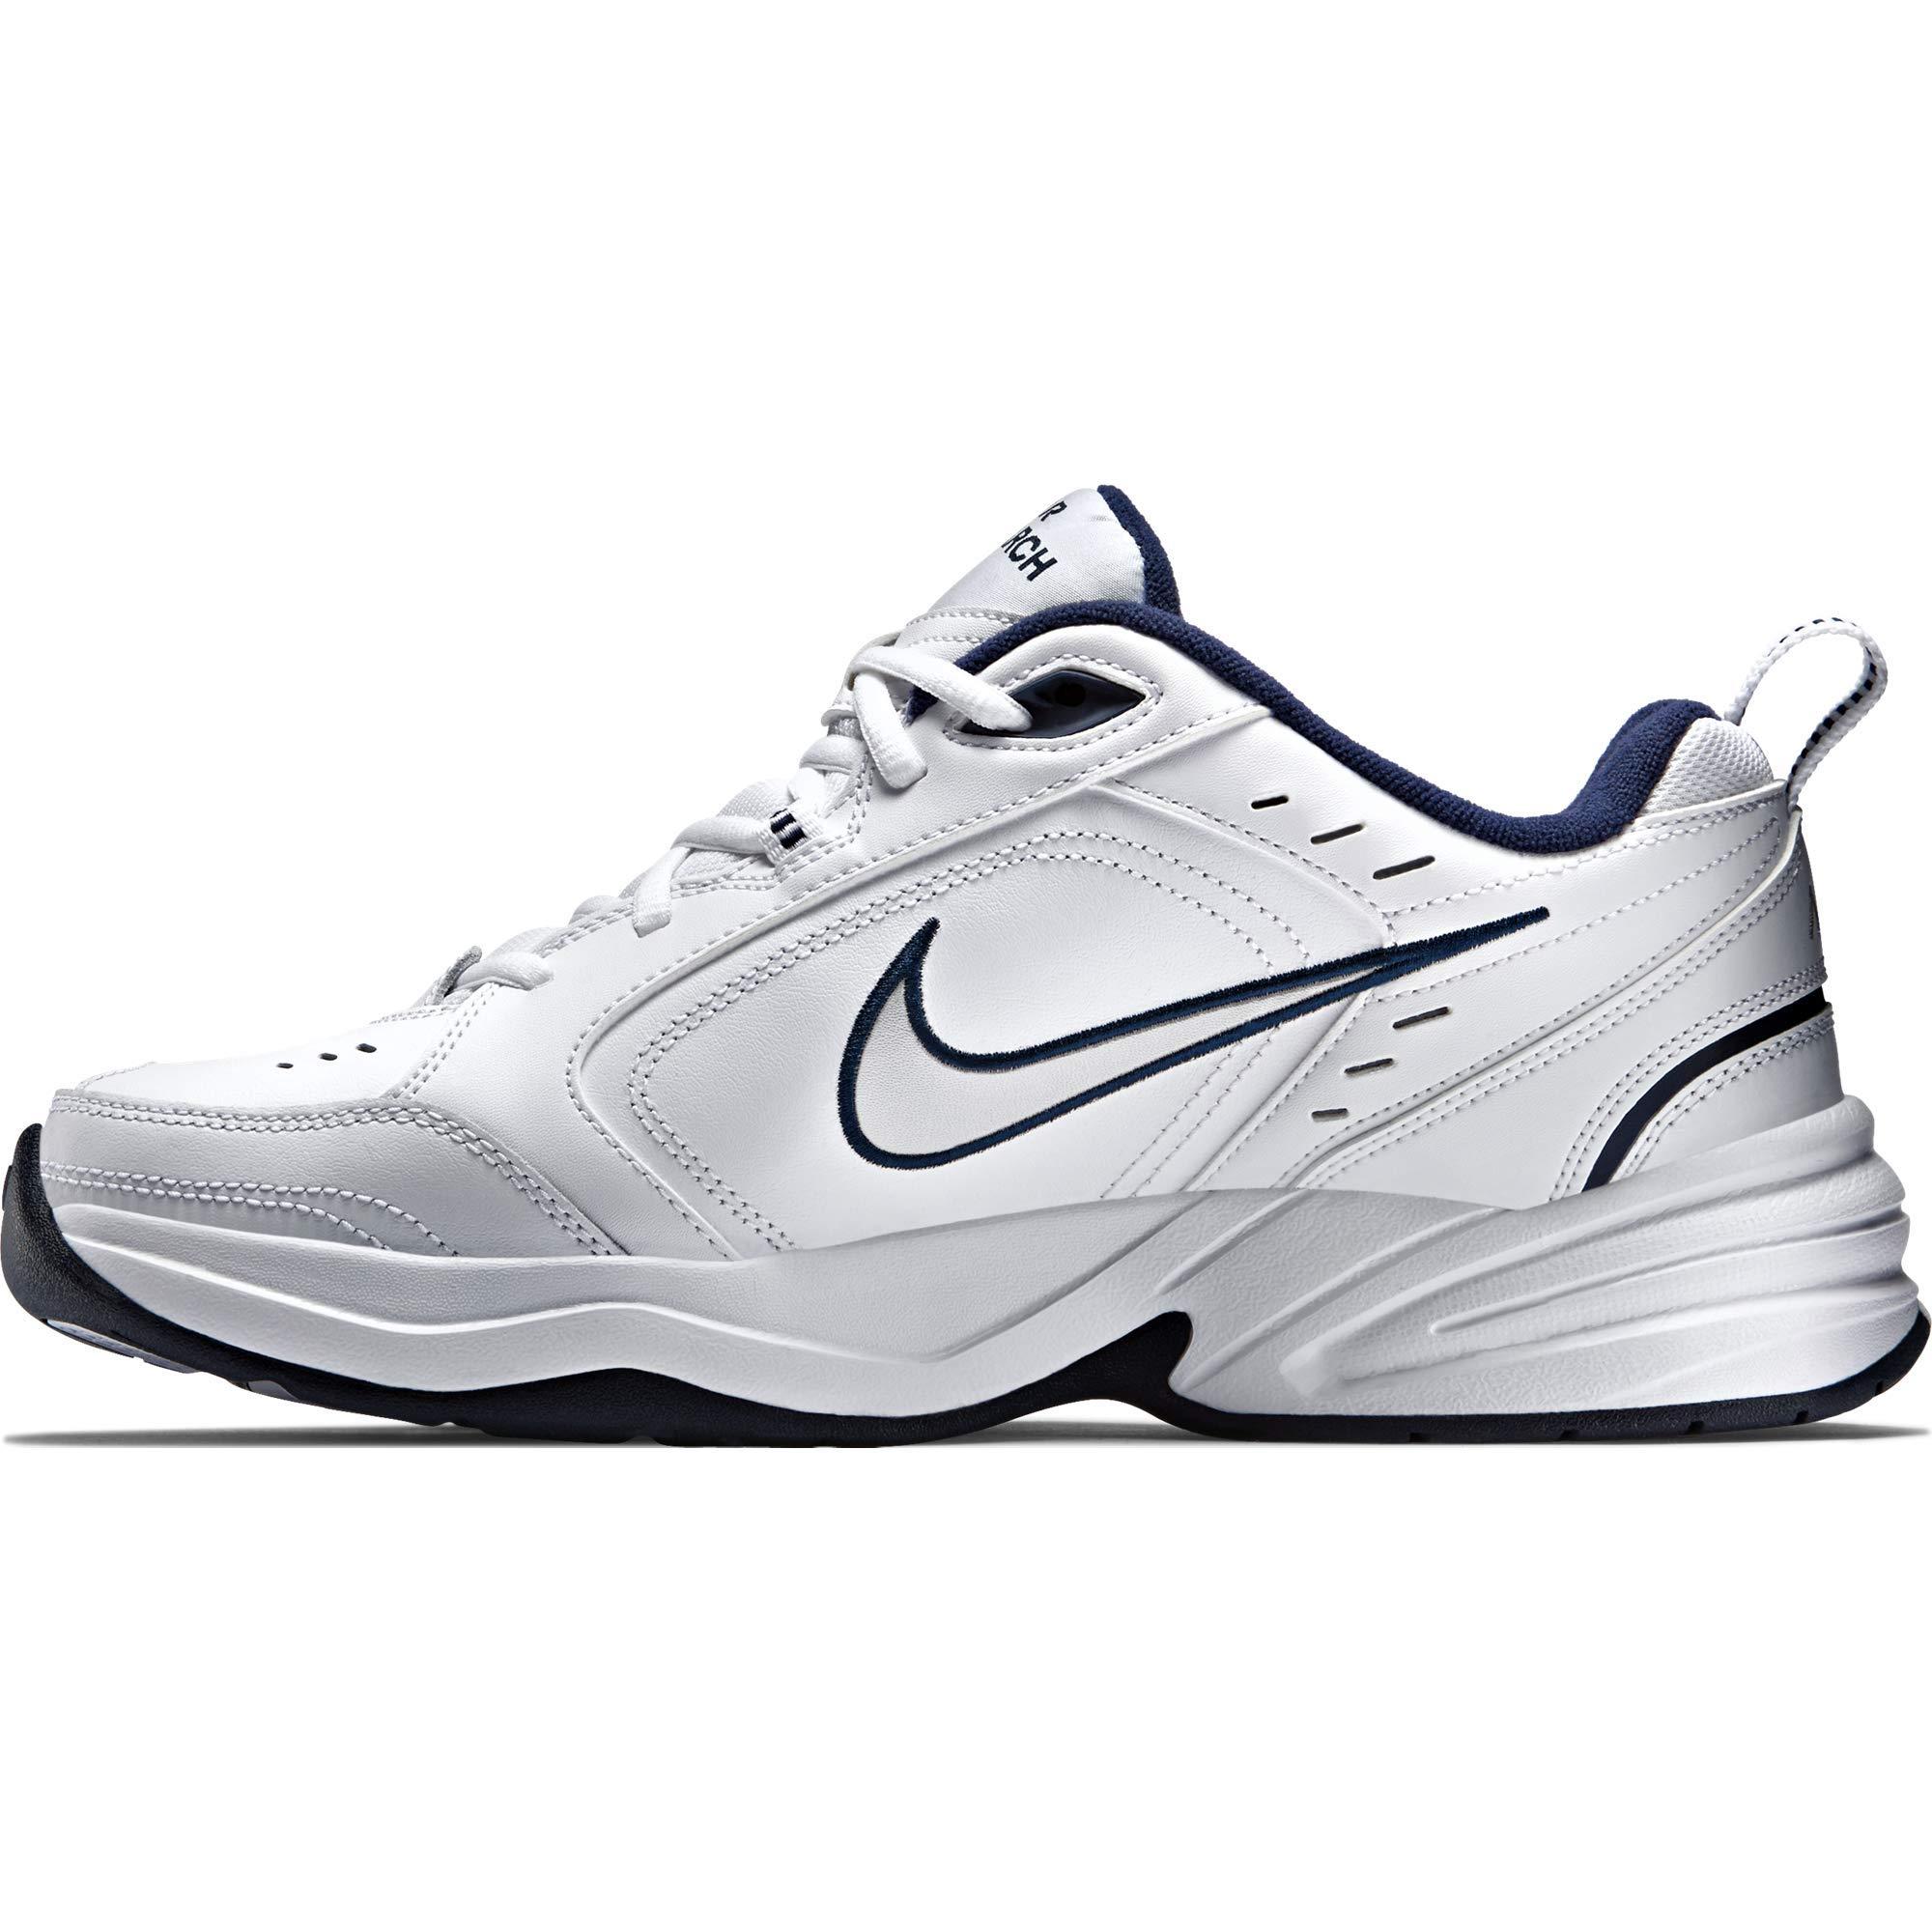 NIKE AIR MONARCH IV (MENS) - 6.5 White/Metallic Silver by Nike (Image #7)